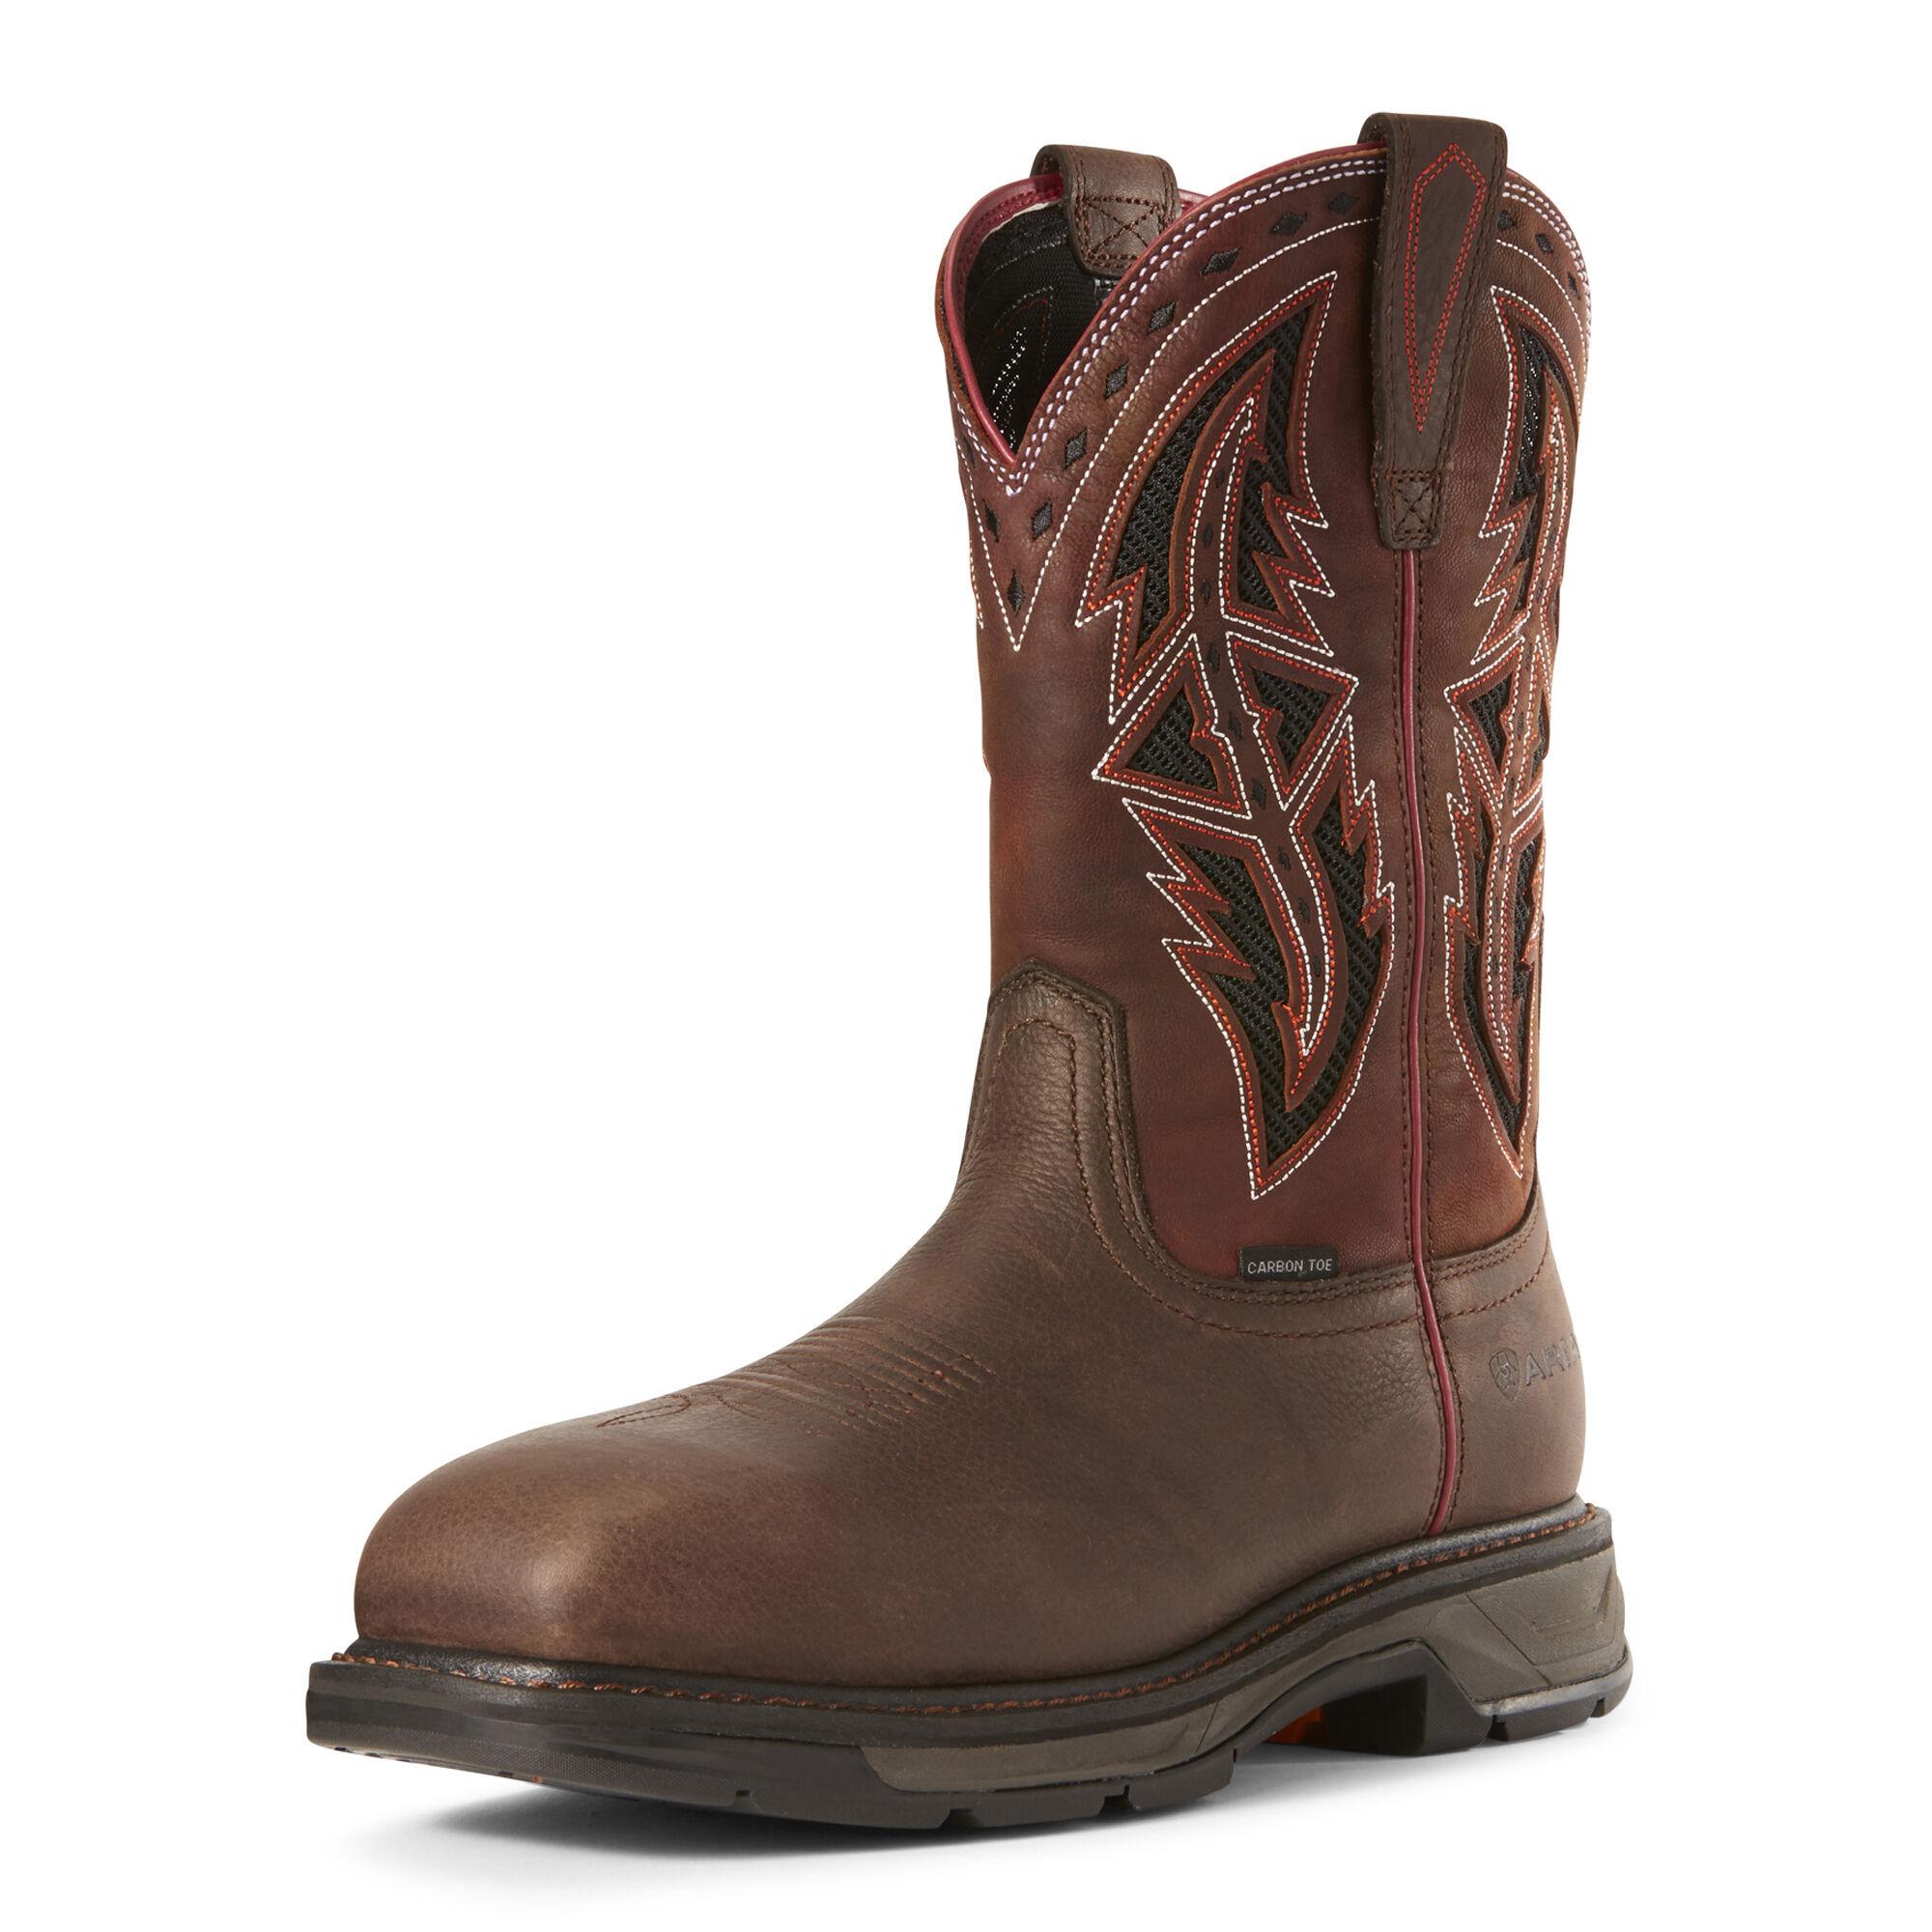 Ariat Men's WorkHog XT VentTEK Spear Carbon Toe Work Boots in Dark Chocolate Leather, Size 11.5 EE / Wide by Ariat